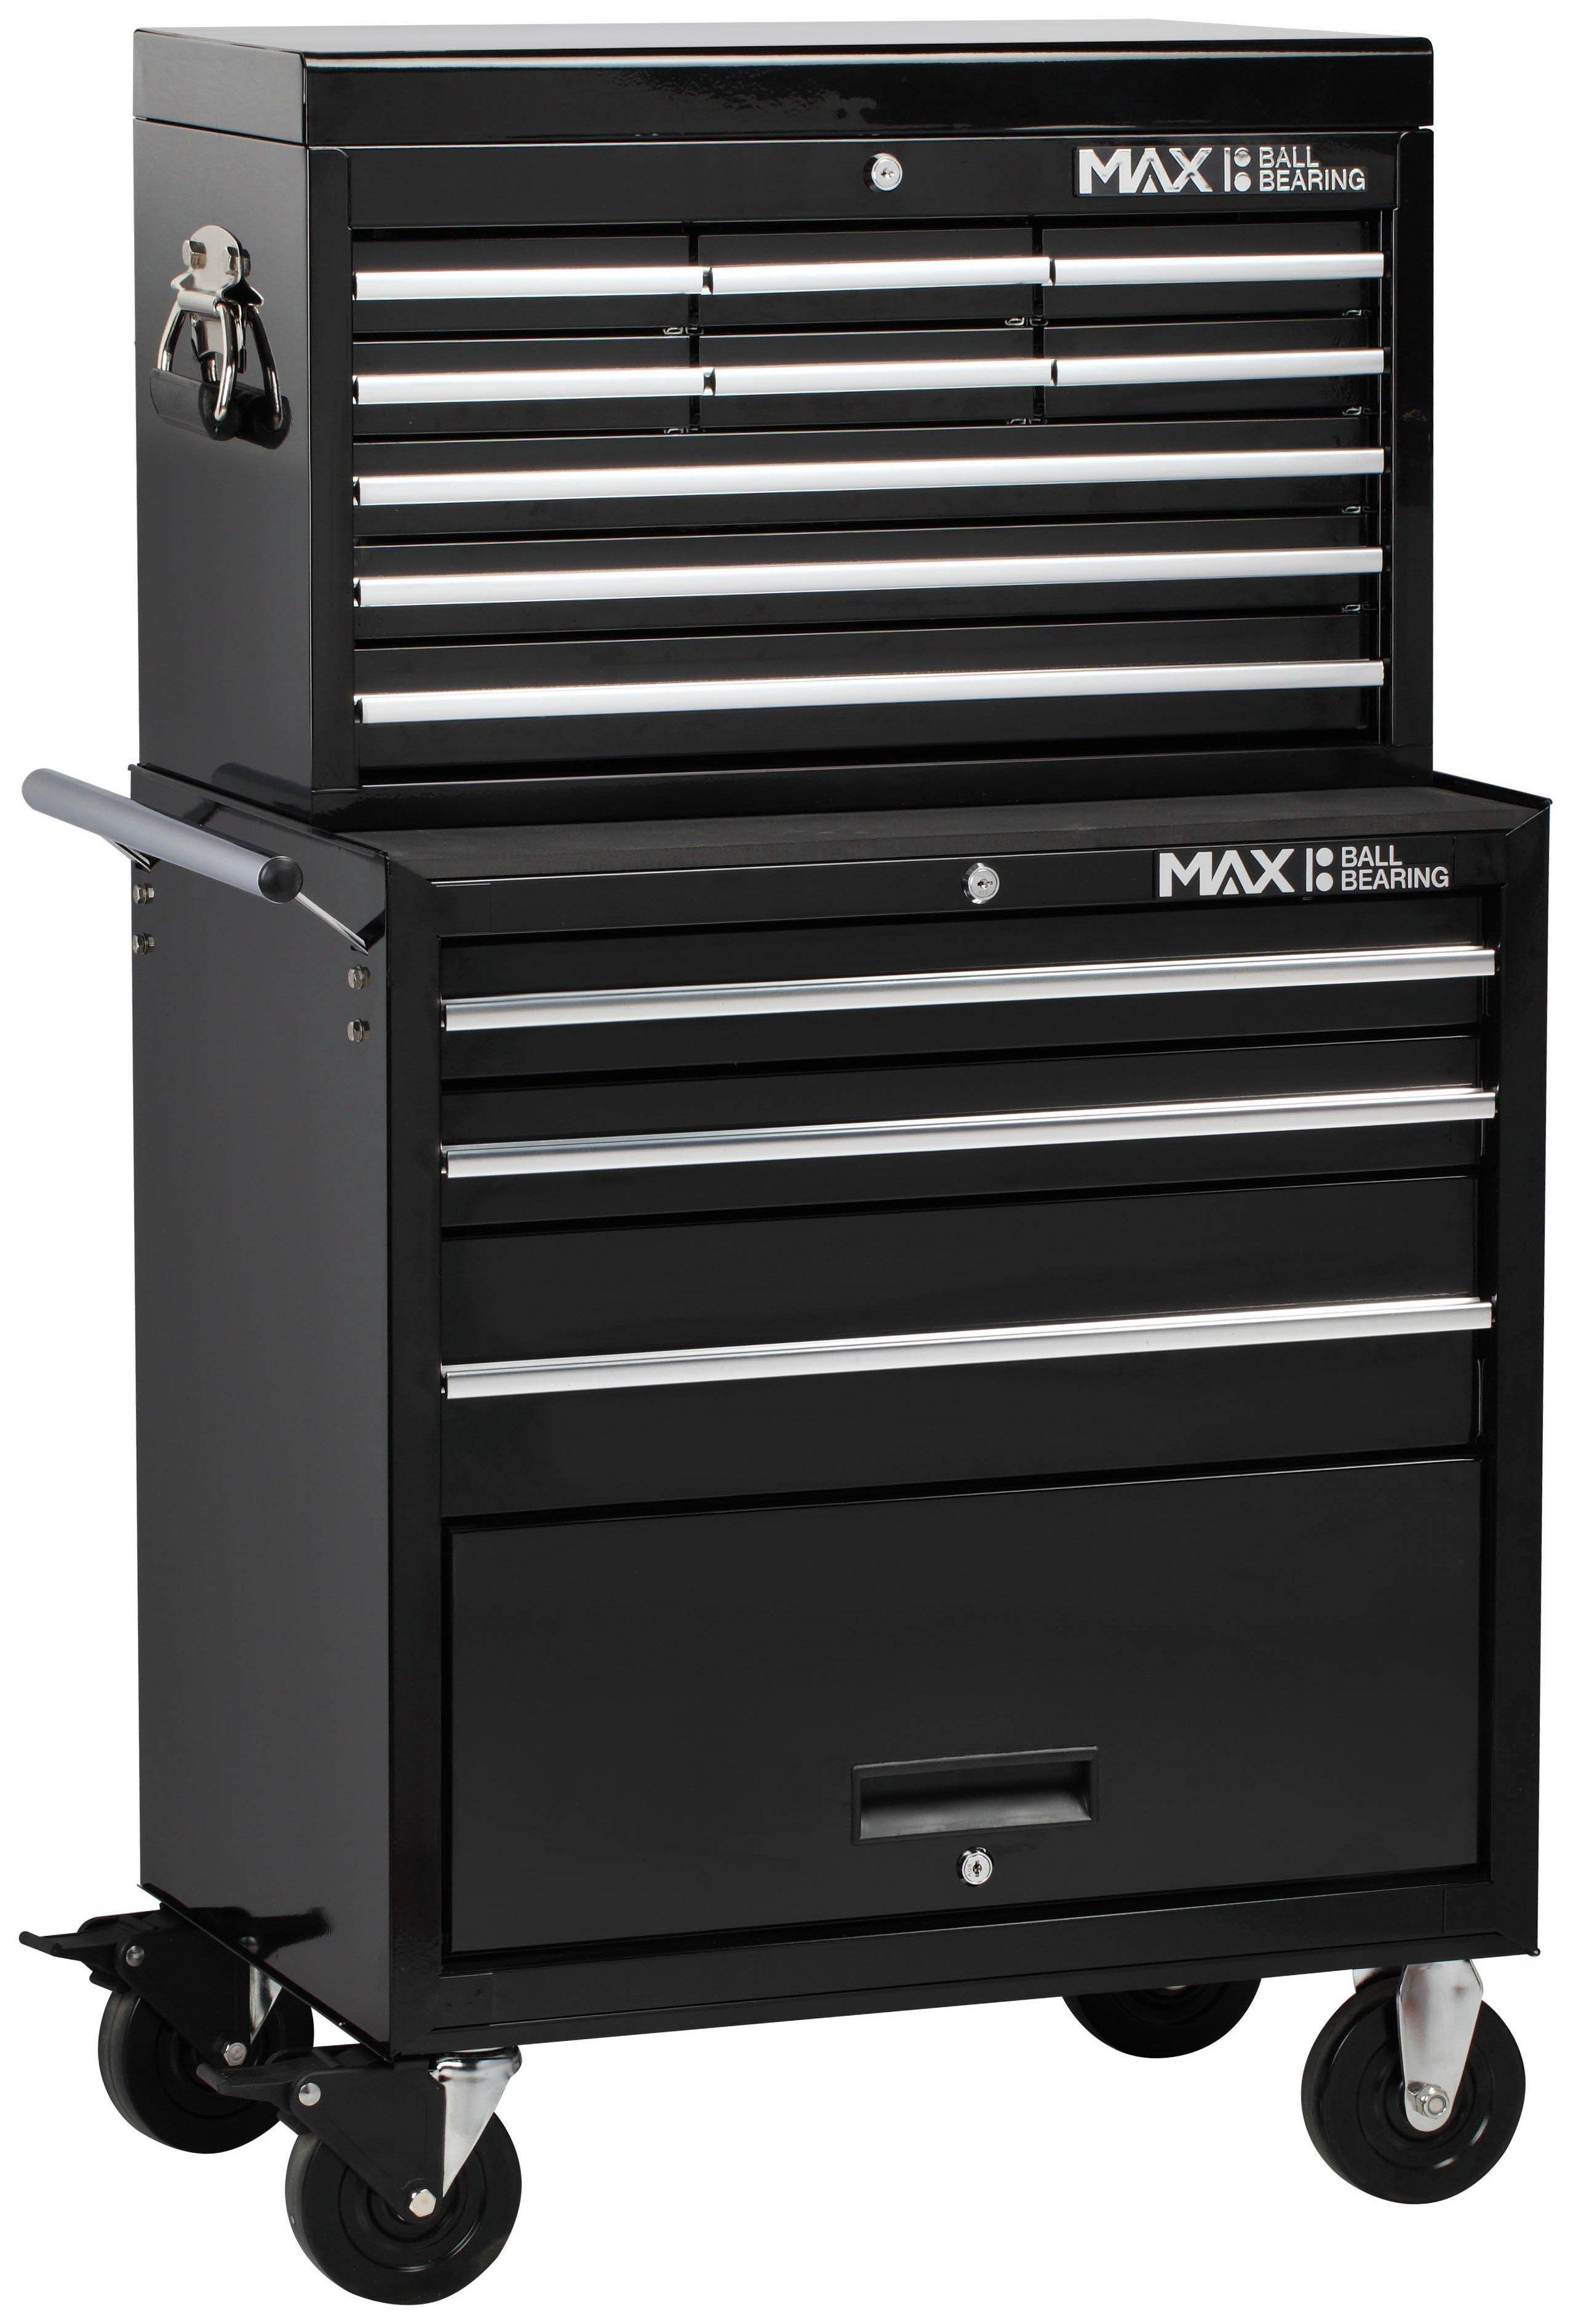 hilka procraft professional 12 drawer tool chest. Black Bedroom Furniture Sets. Home Design Ideas